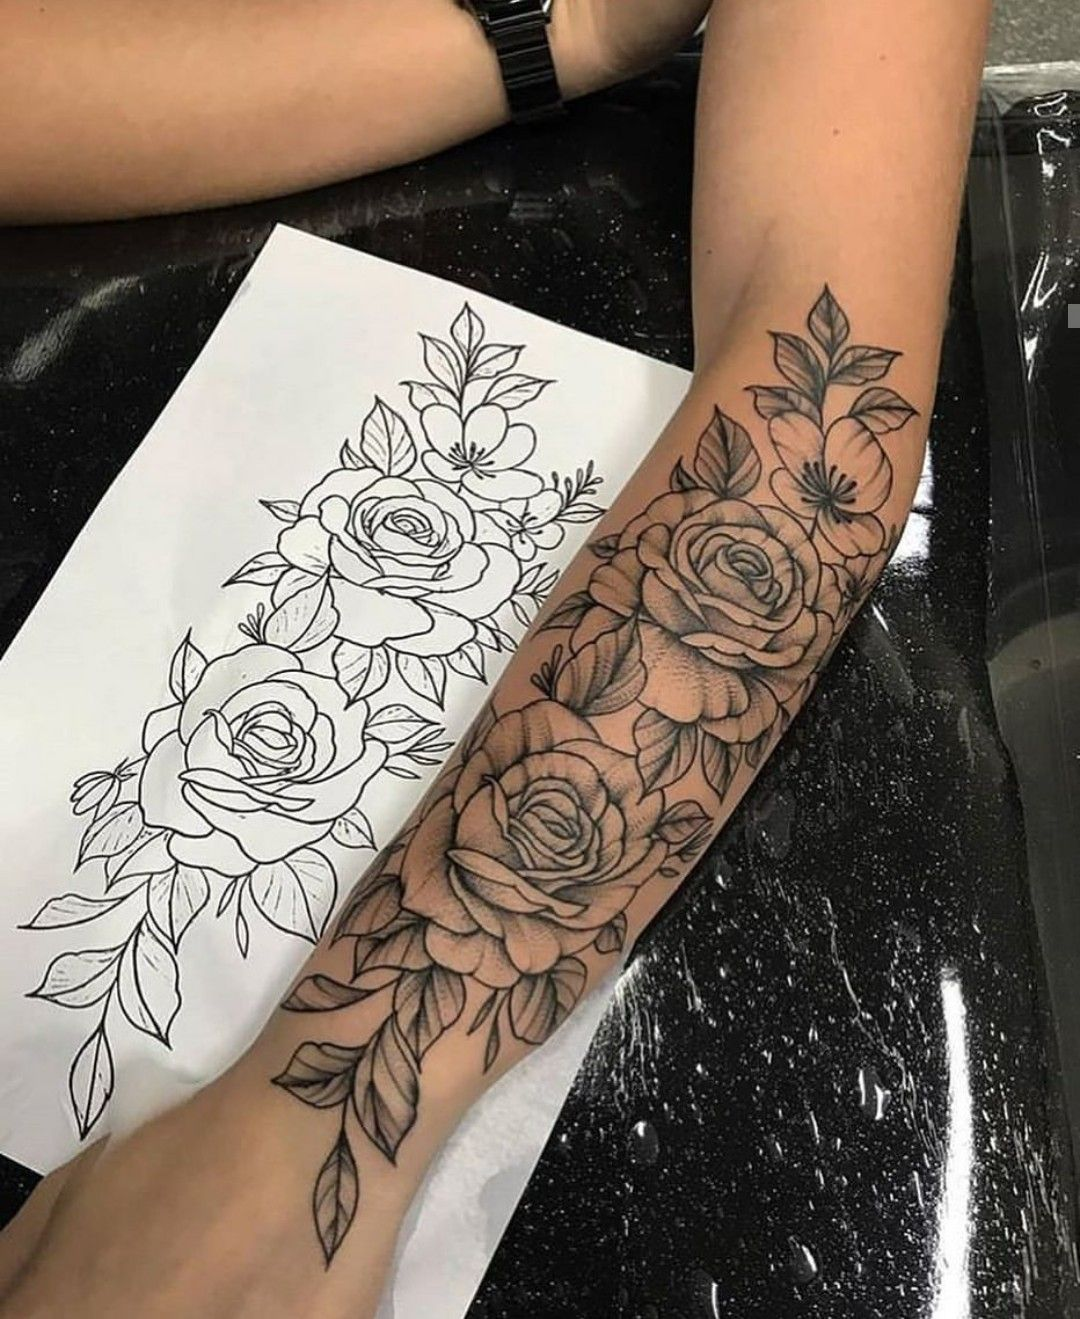 Pin von Cindy Ott auf TATUAJES | Tattoo ideen unterarm